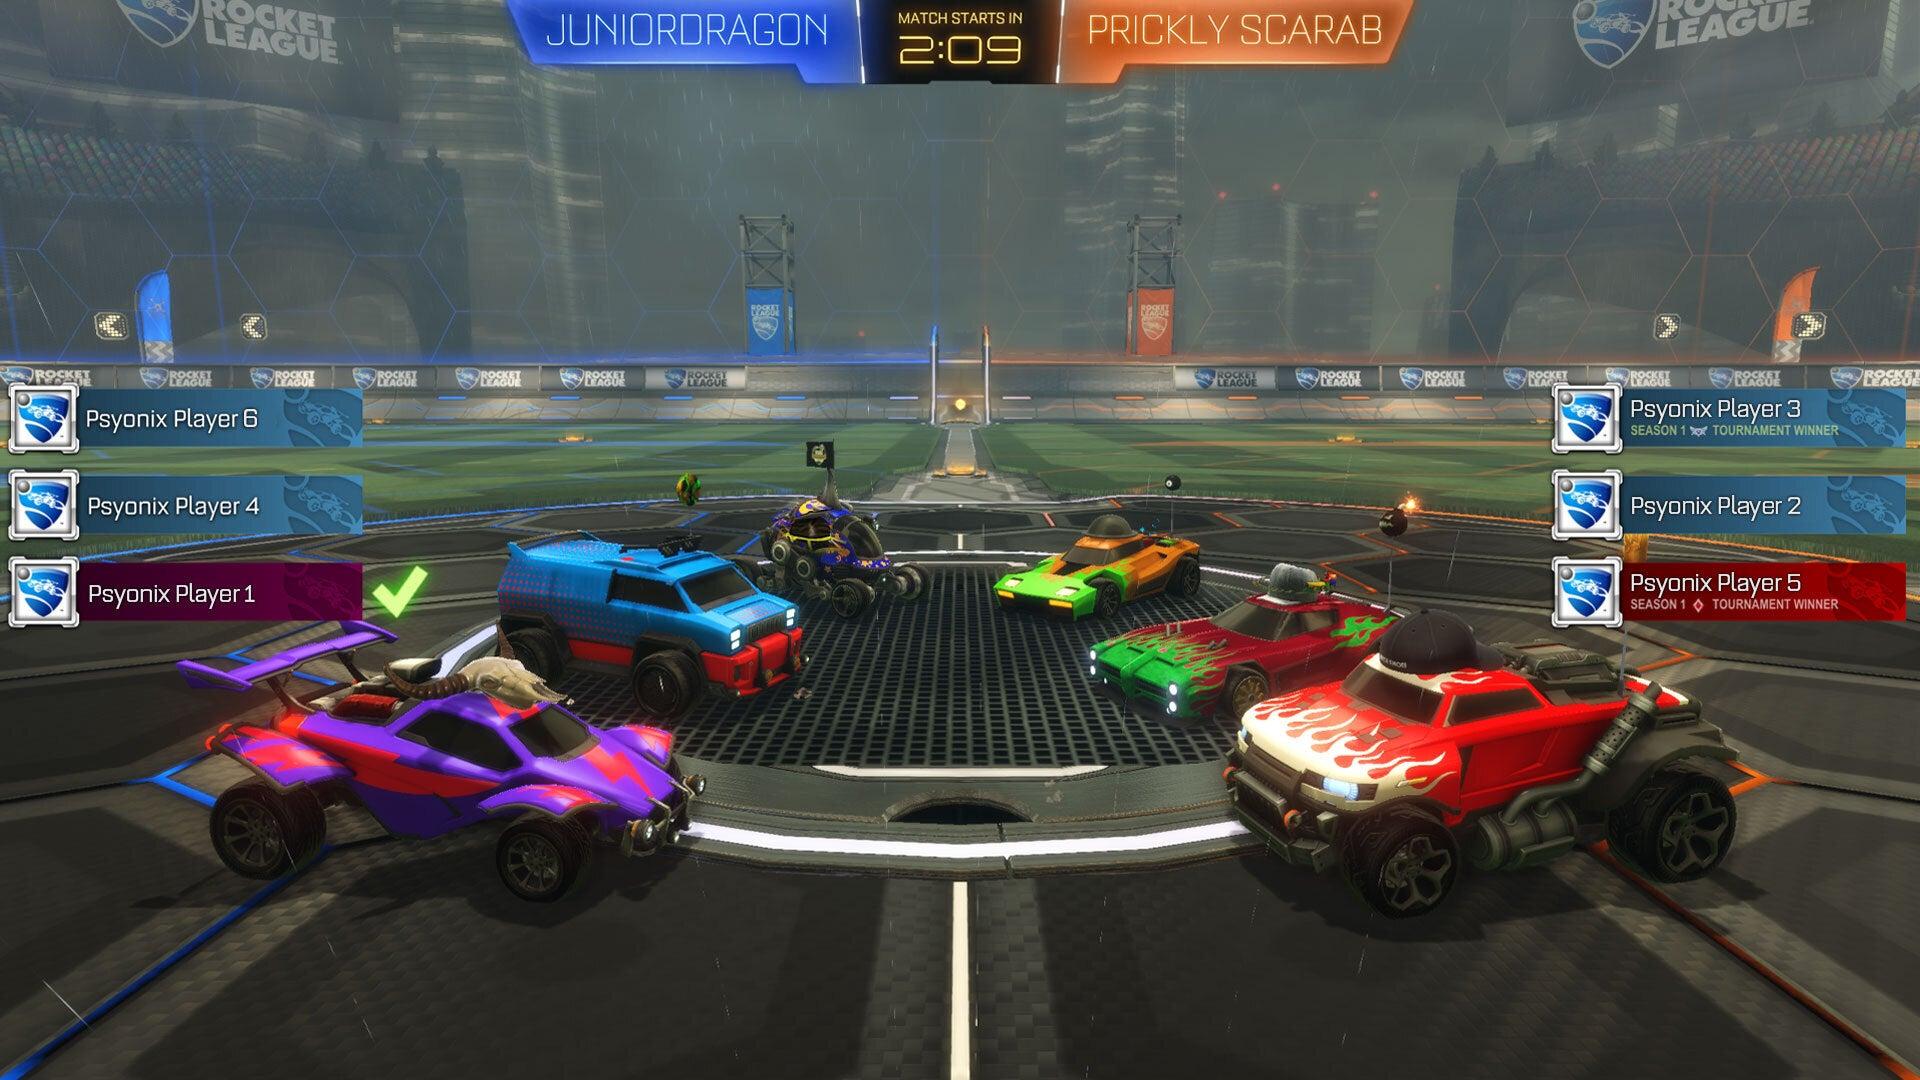 Tournaments Lobby